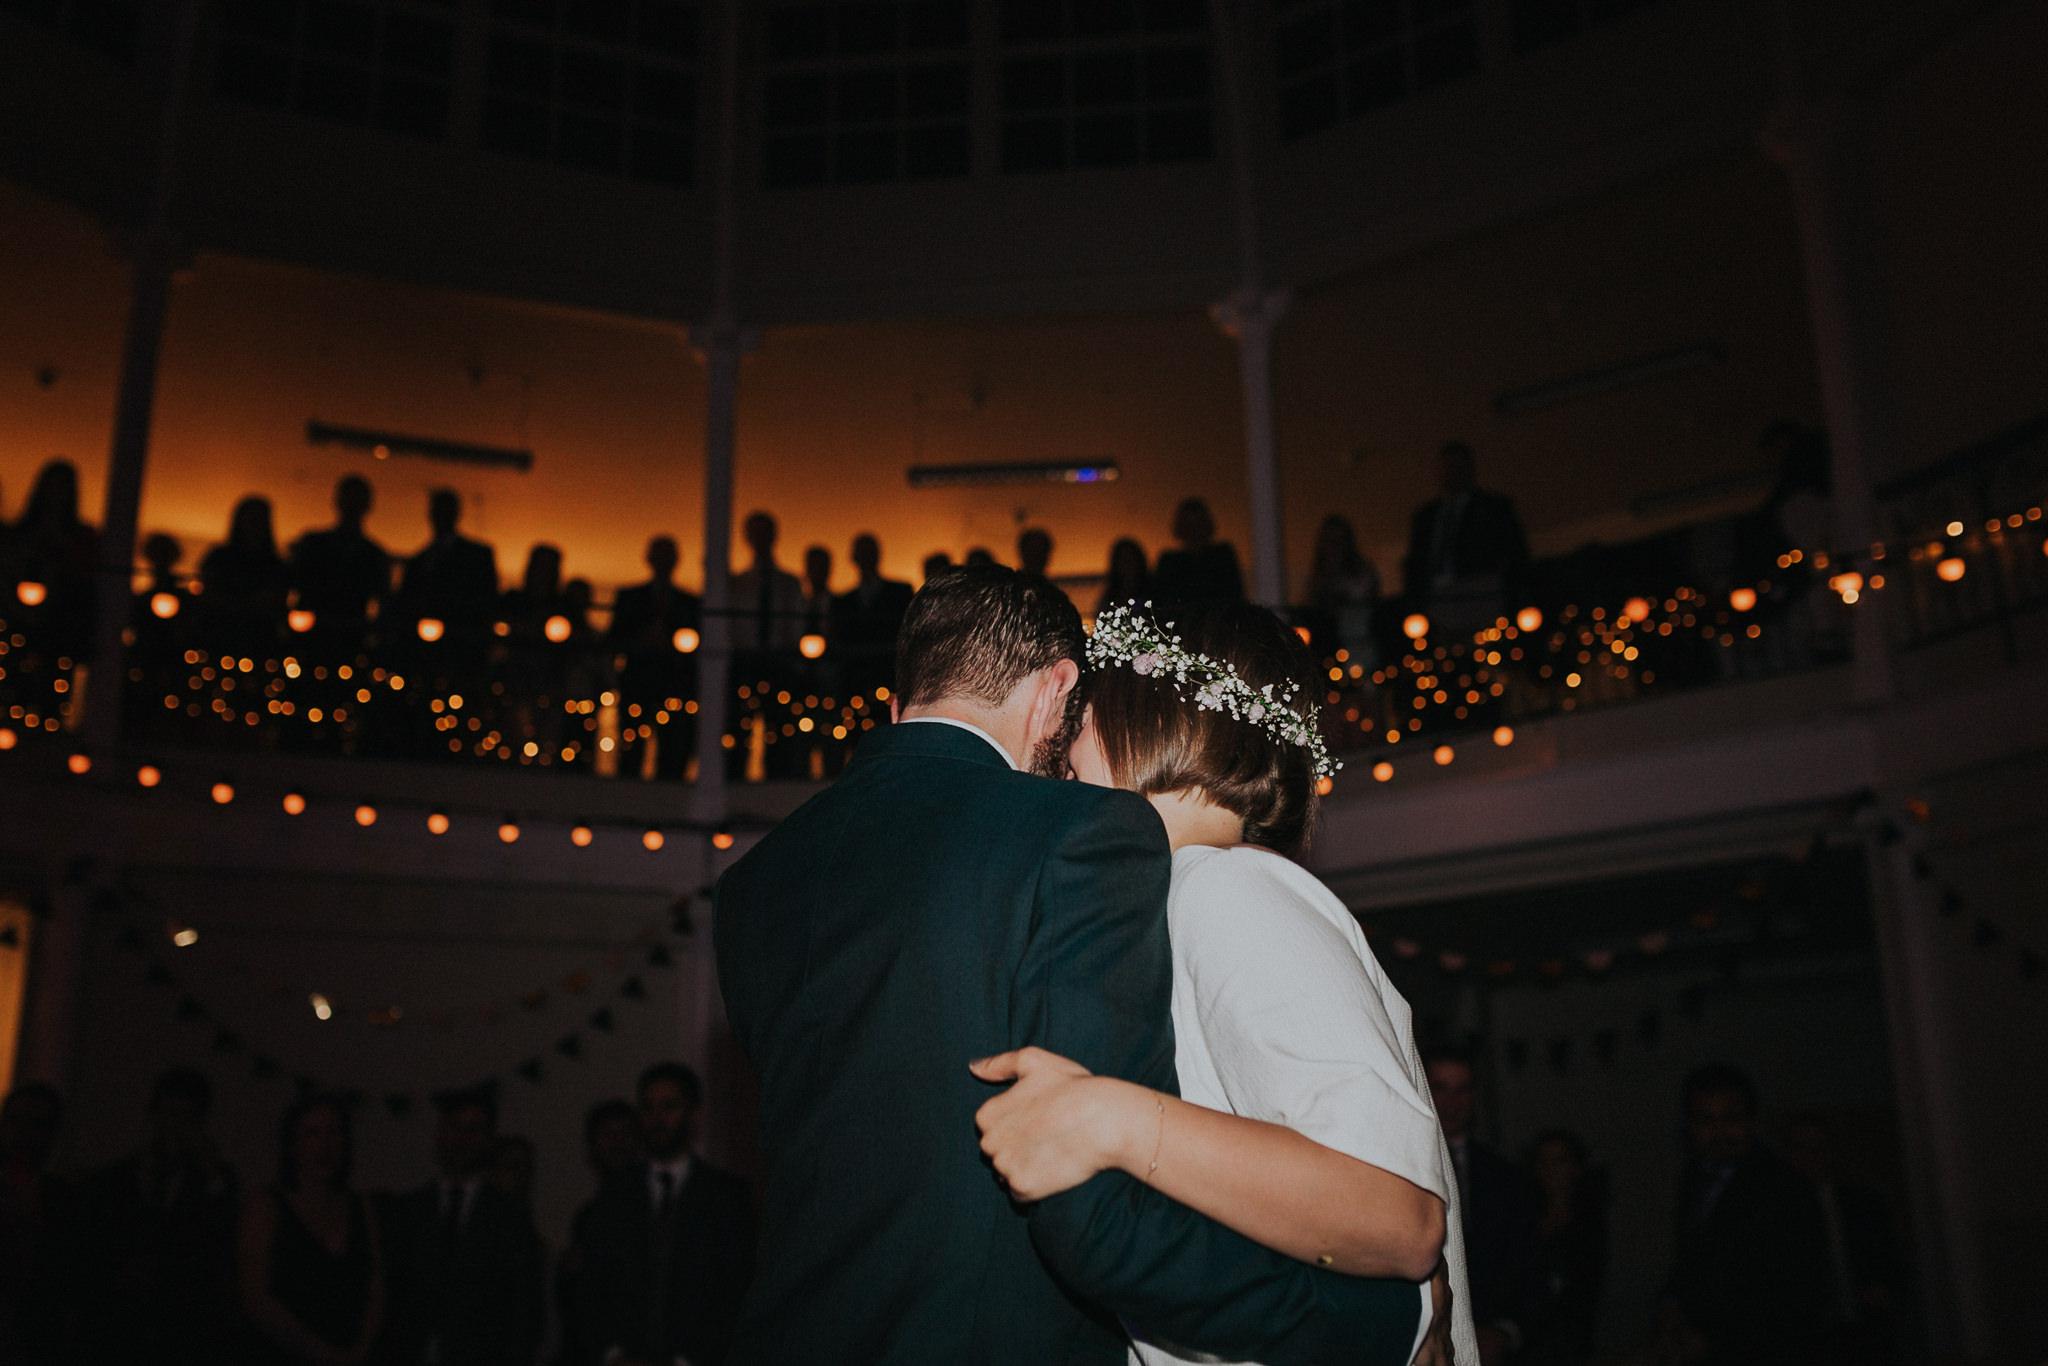 kate-gray-london-wedding-photography-89.jpg